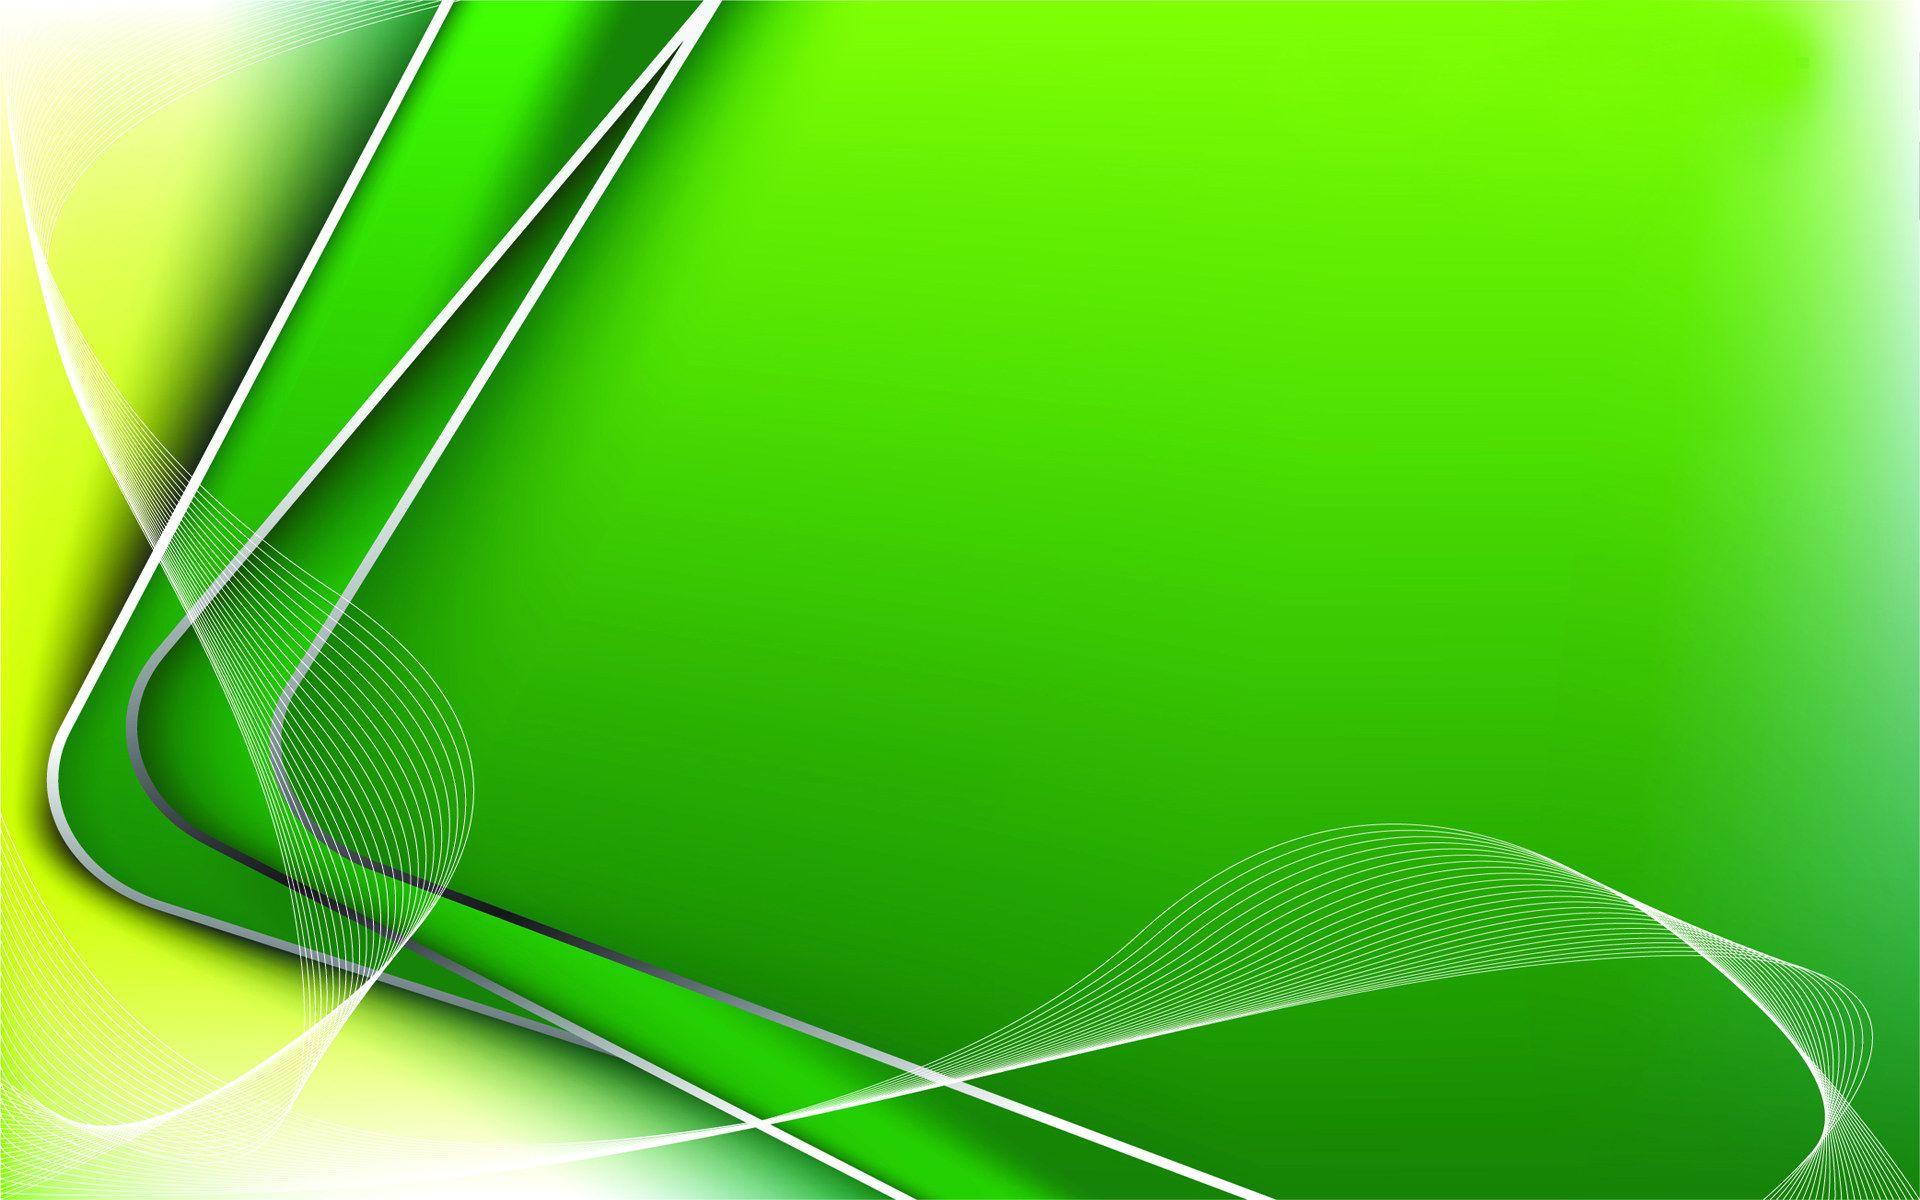 Green Corners Wallpaper